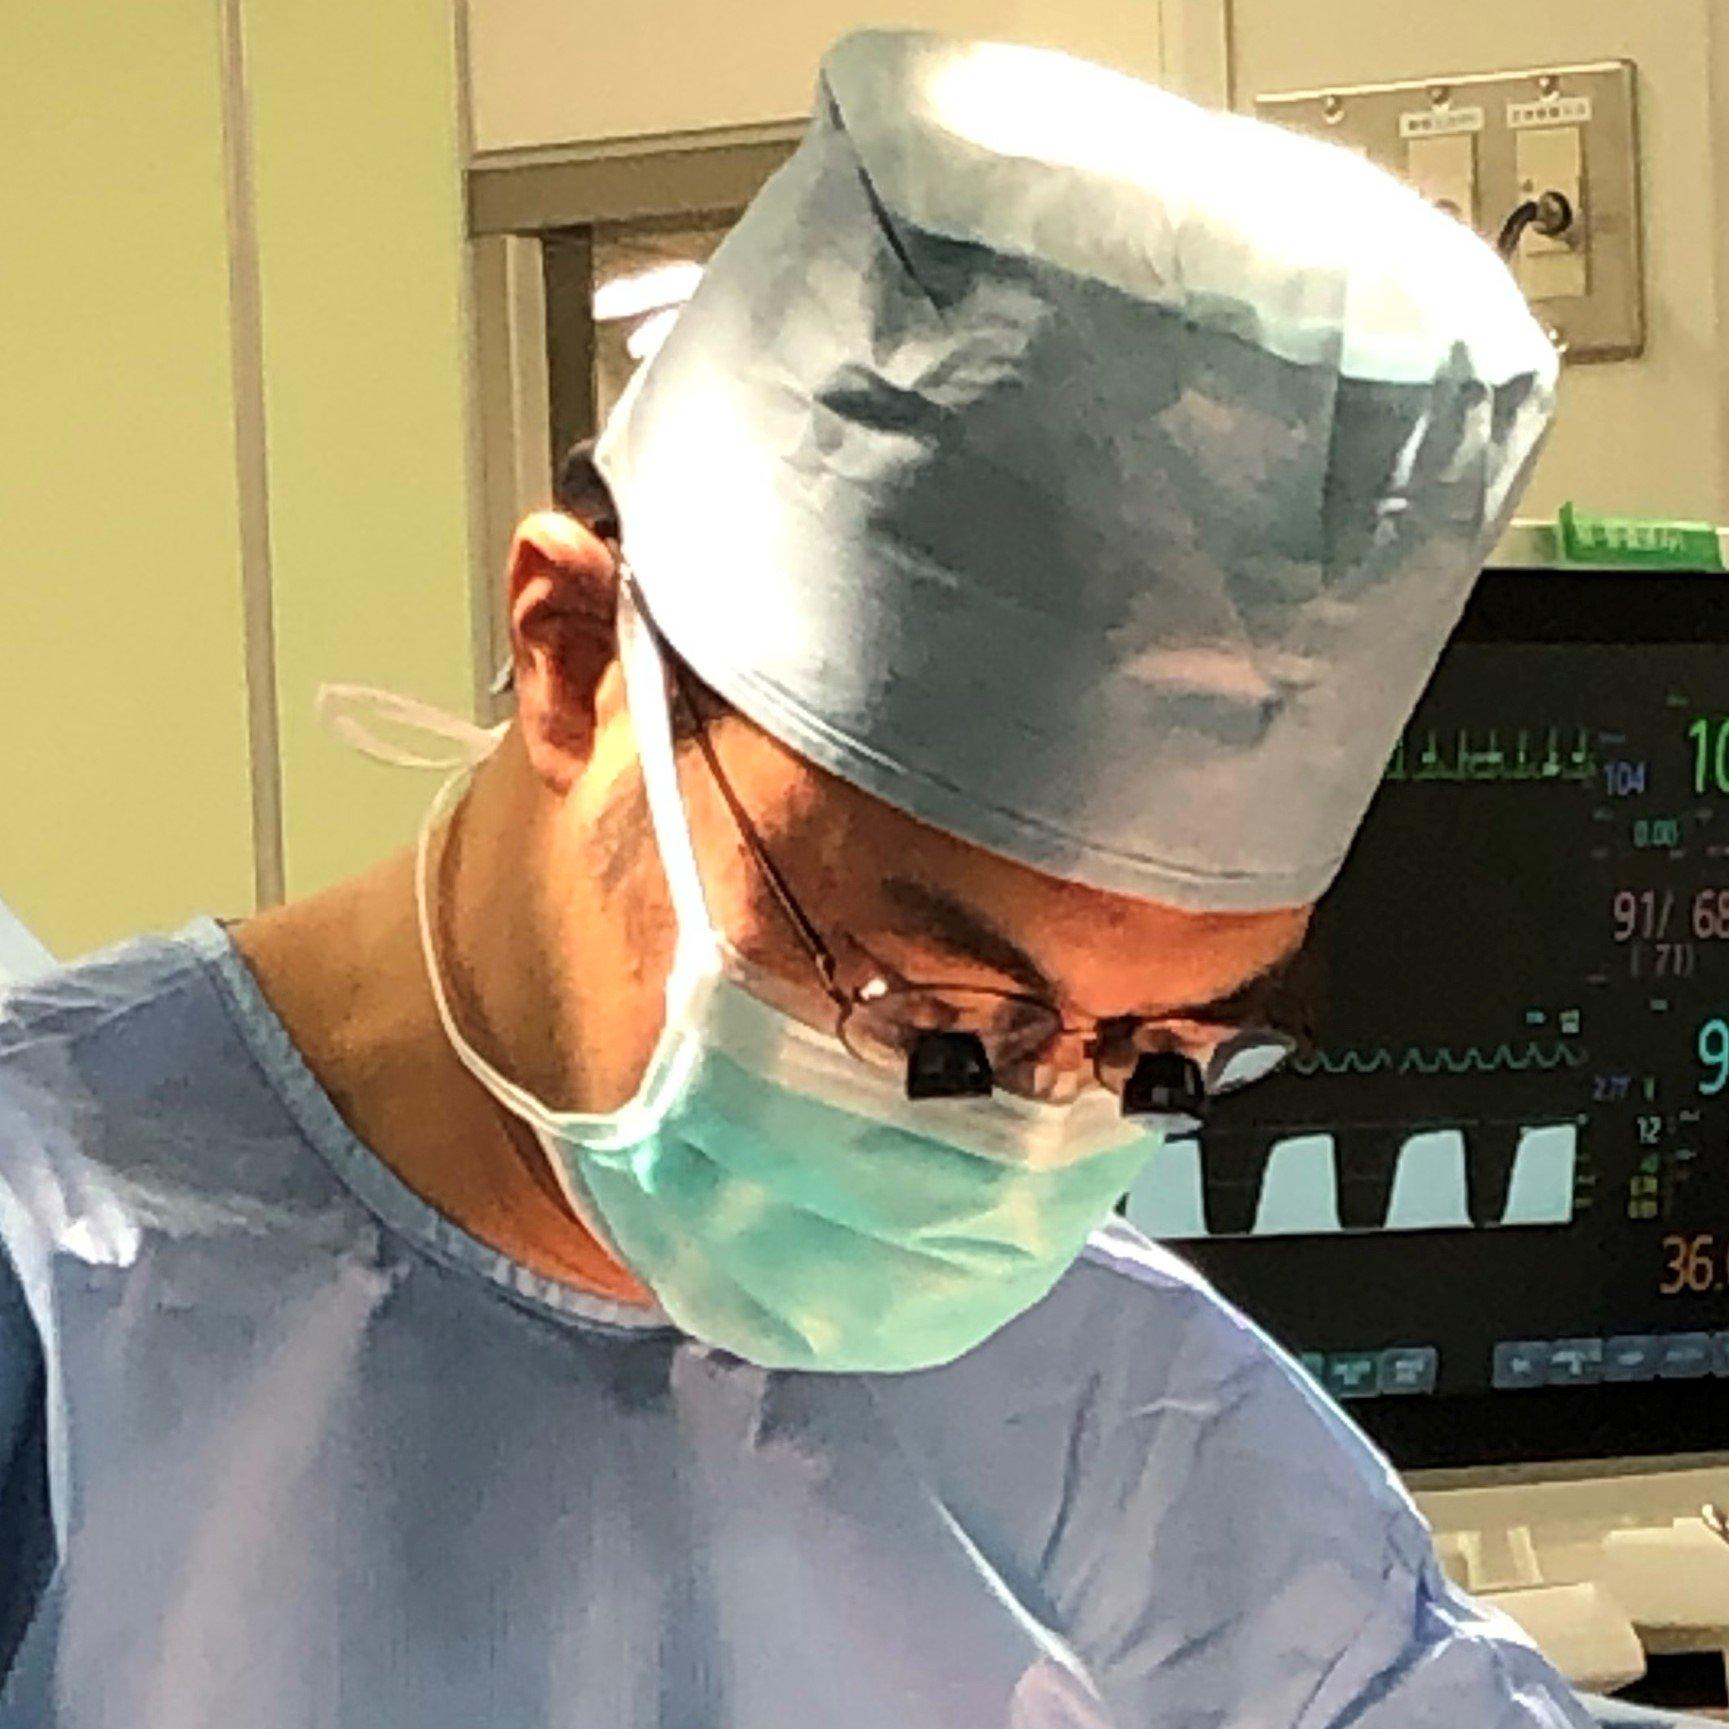 尾形 哲 (Satoshi OGATA) 肝臓先生